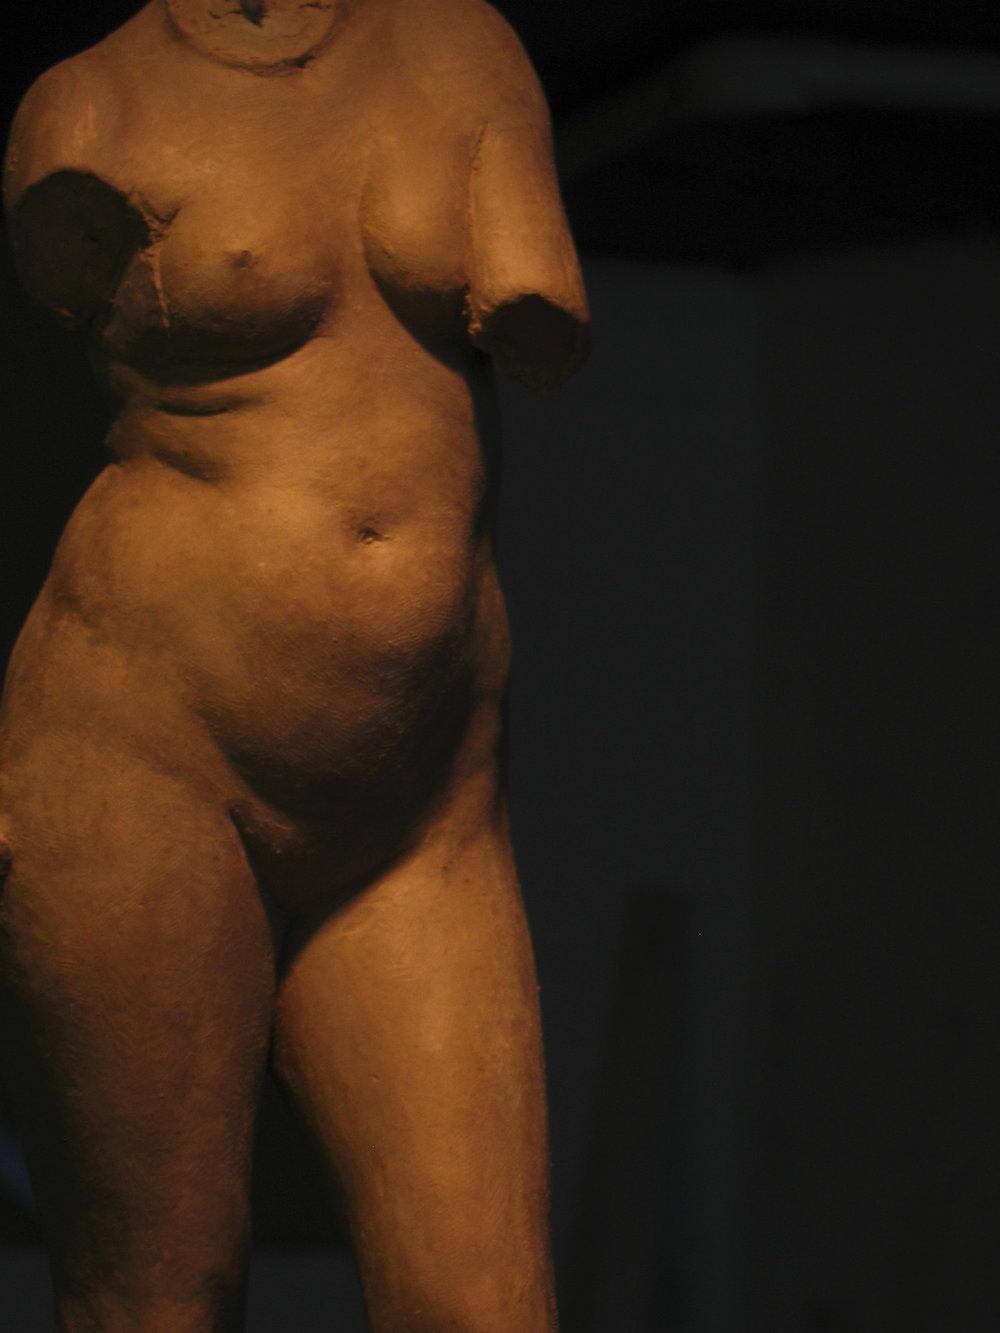 Small figure.